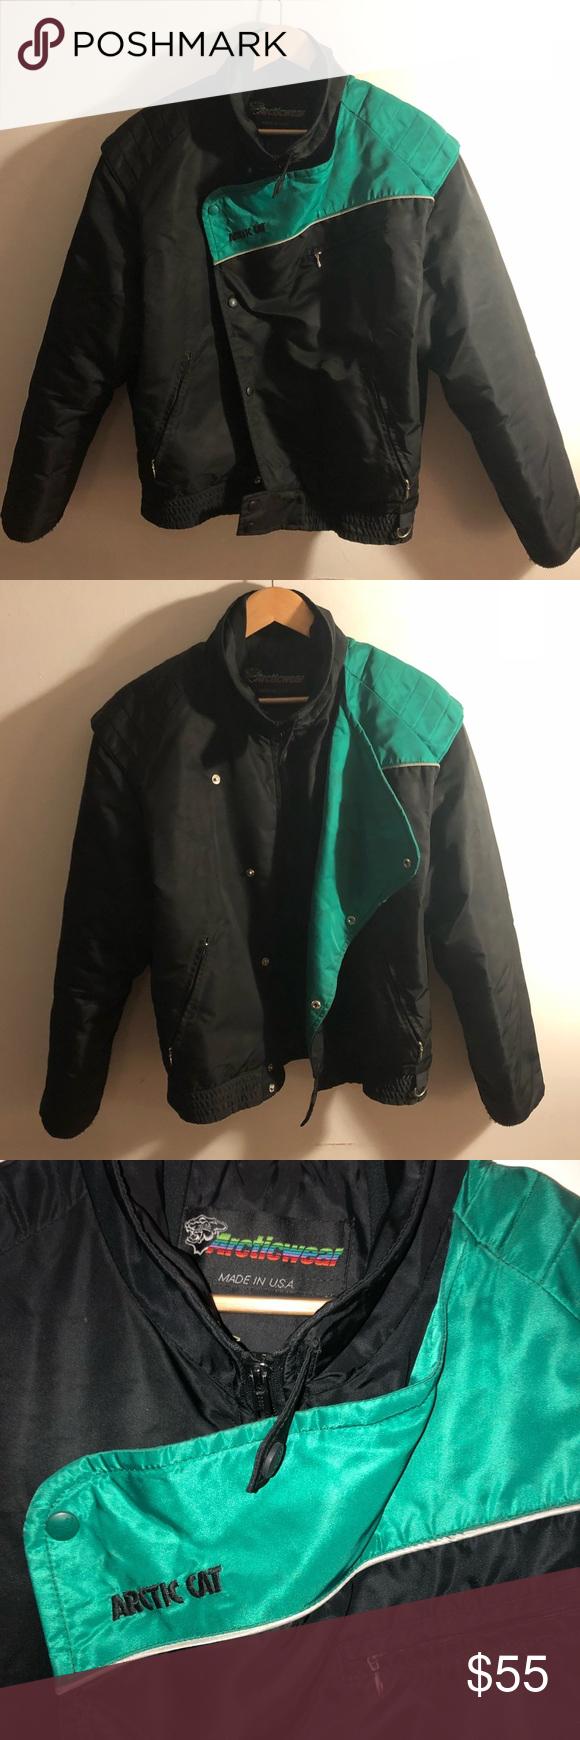 Arcticwear Arctic Cat Jacket Jackets, Fashion, Jackets